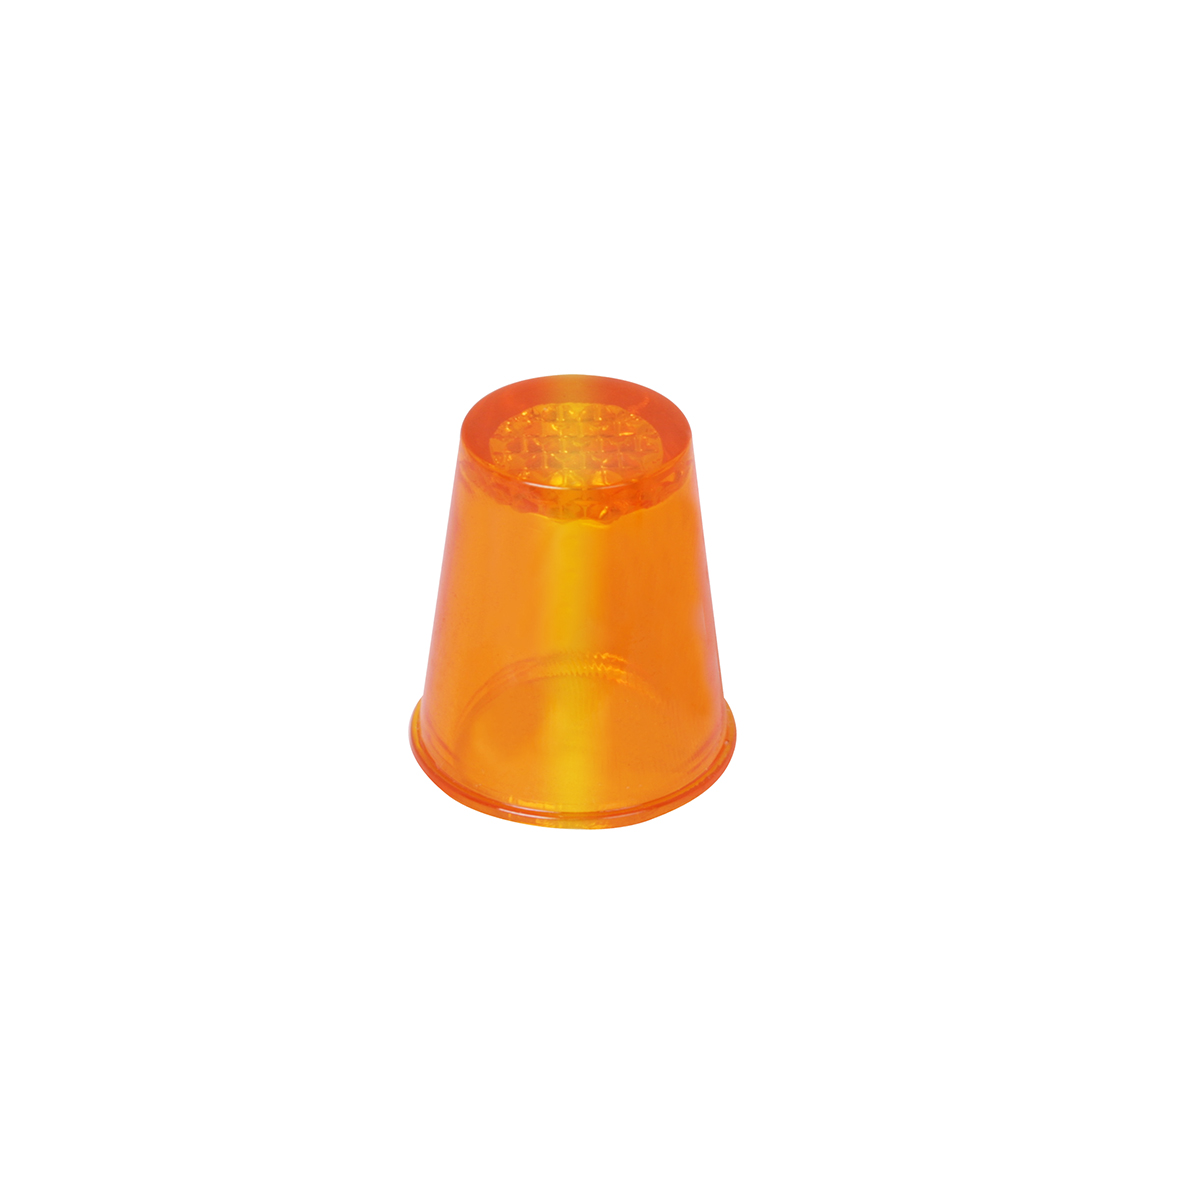 #94125 Amber Cap Style Lens